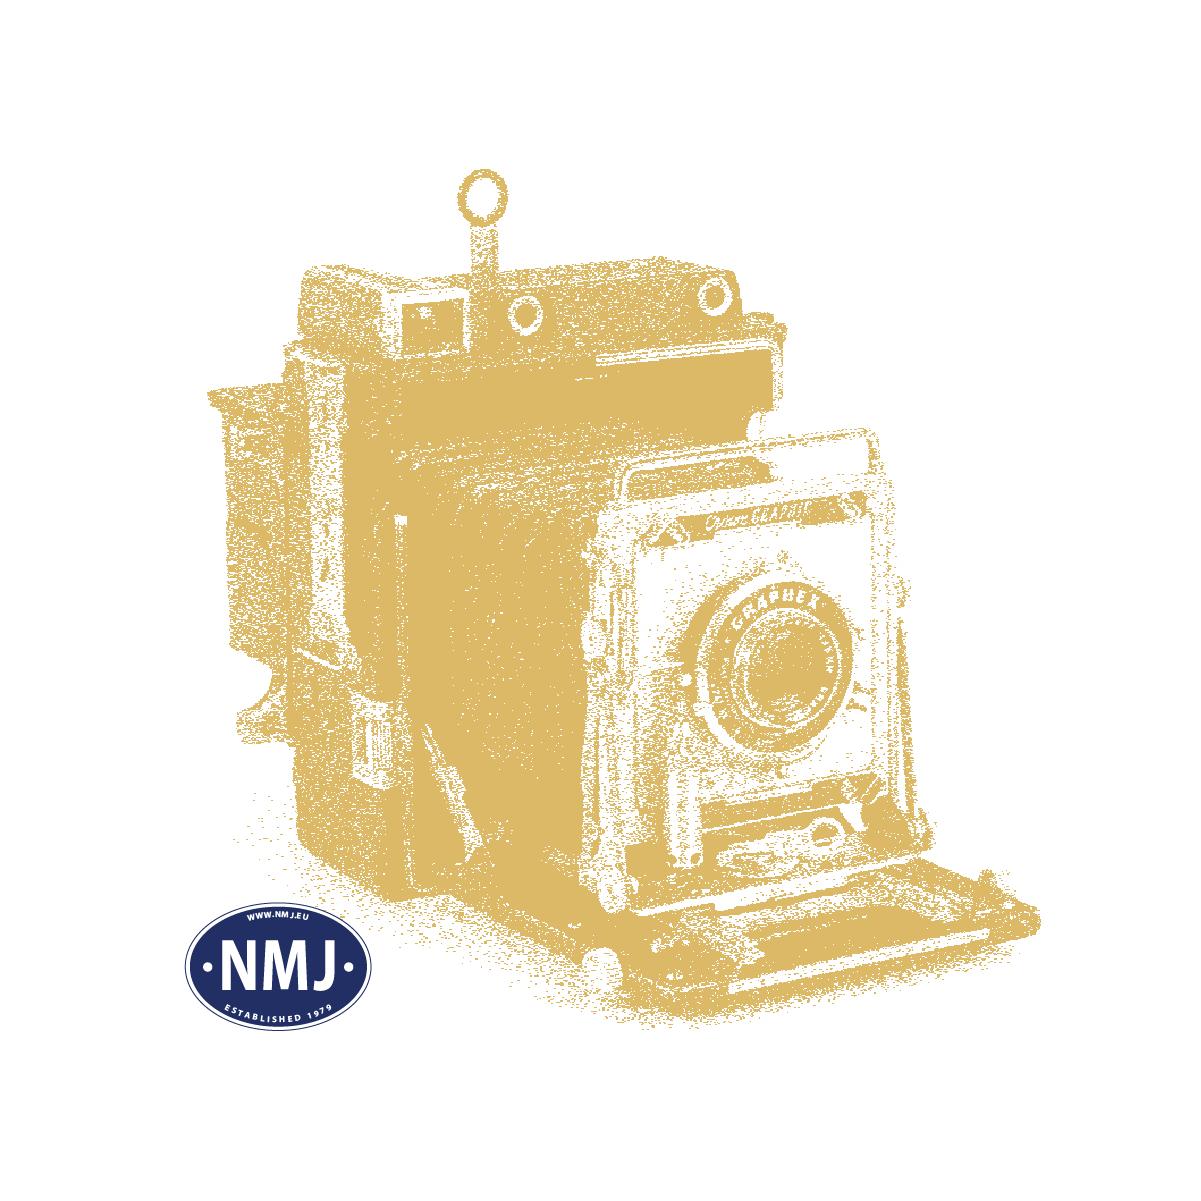 NMJST310591 - NMJ Superline NSB T3 10591 Stakevogn m/ Bremseplattform